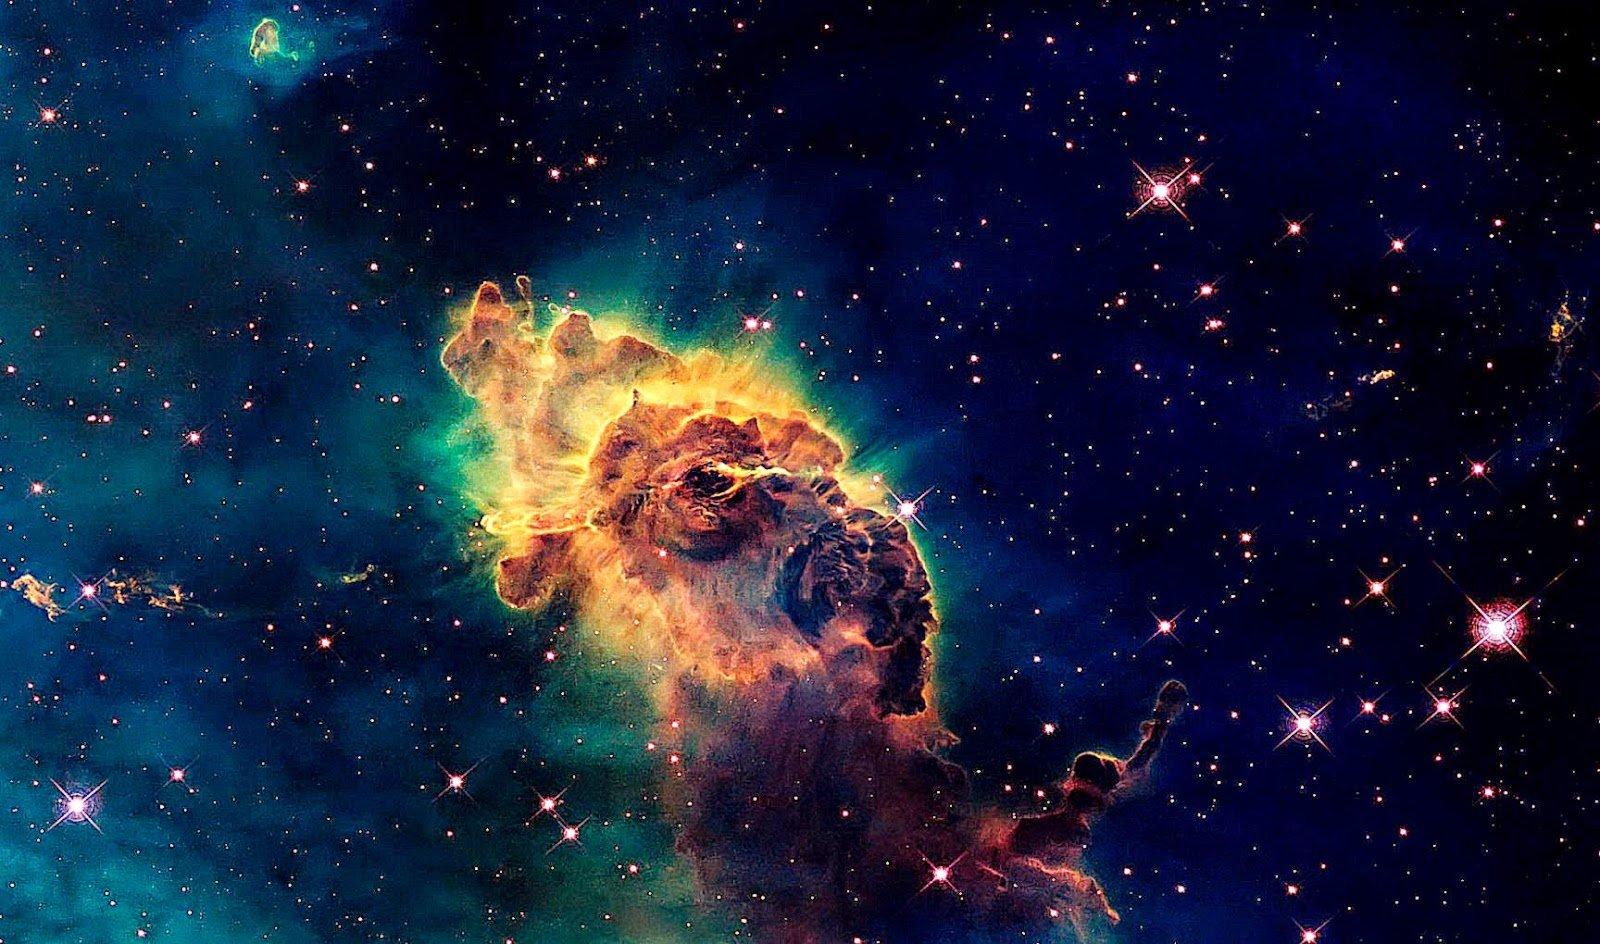 Space Galaxy Wallpaper Hd Cool HD Wallpapers 1600x944